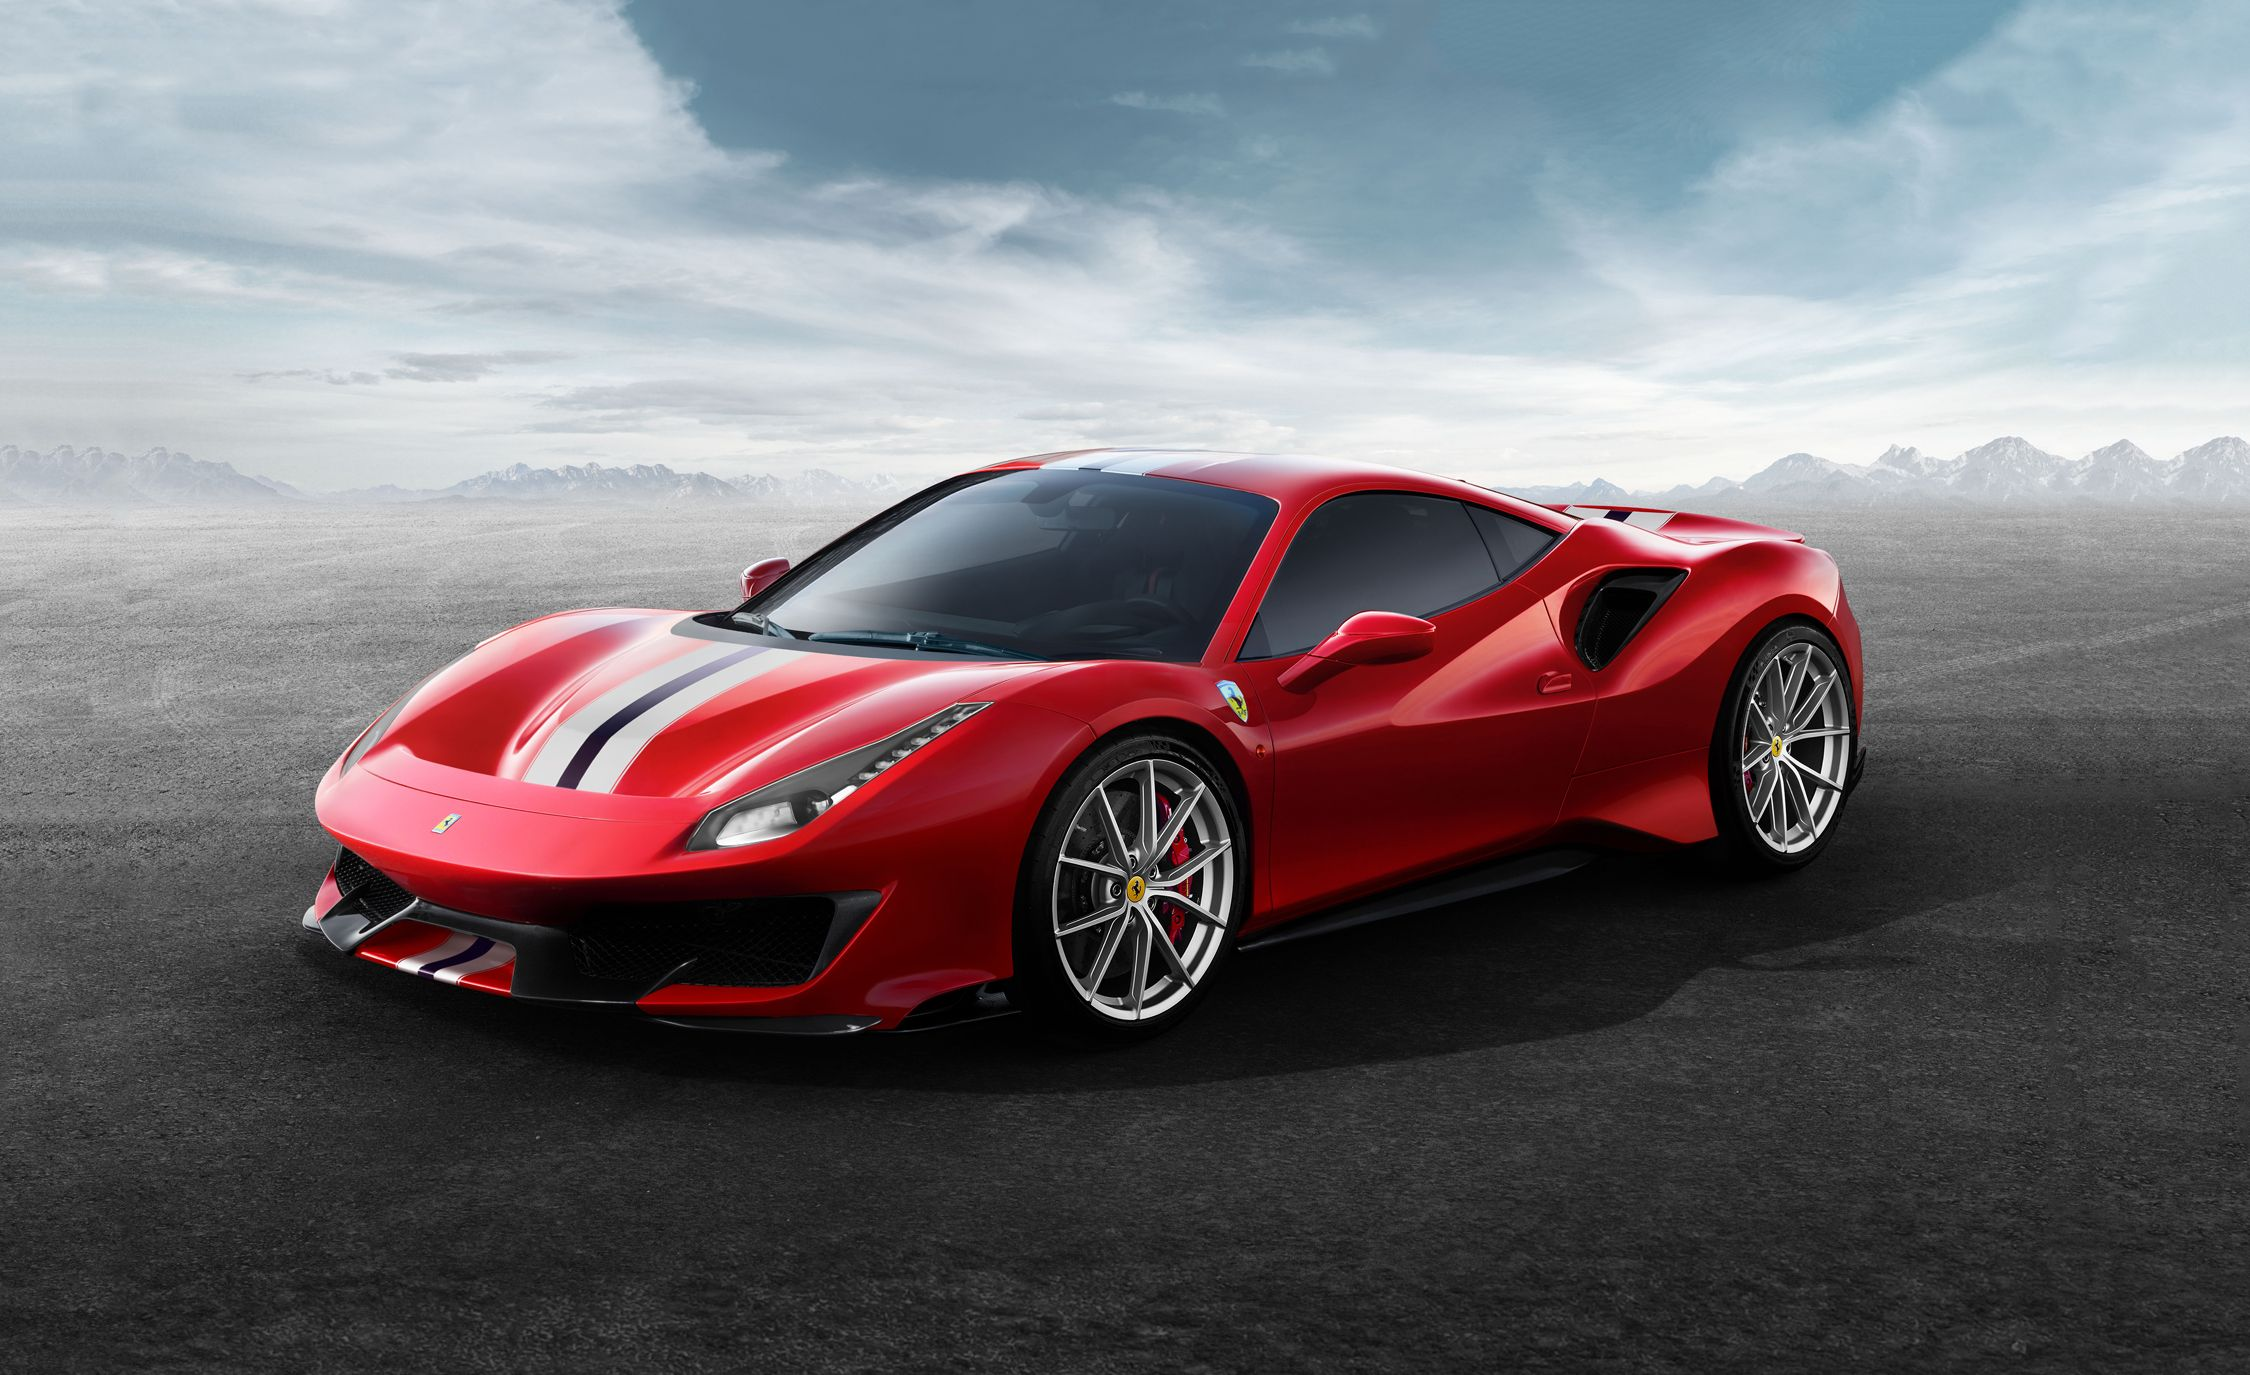 ferrari price. ferrari 488gtb reviews   price, photos, and specs car driver price